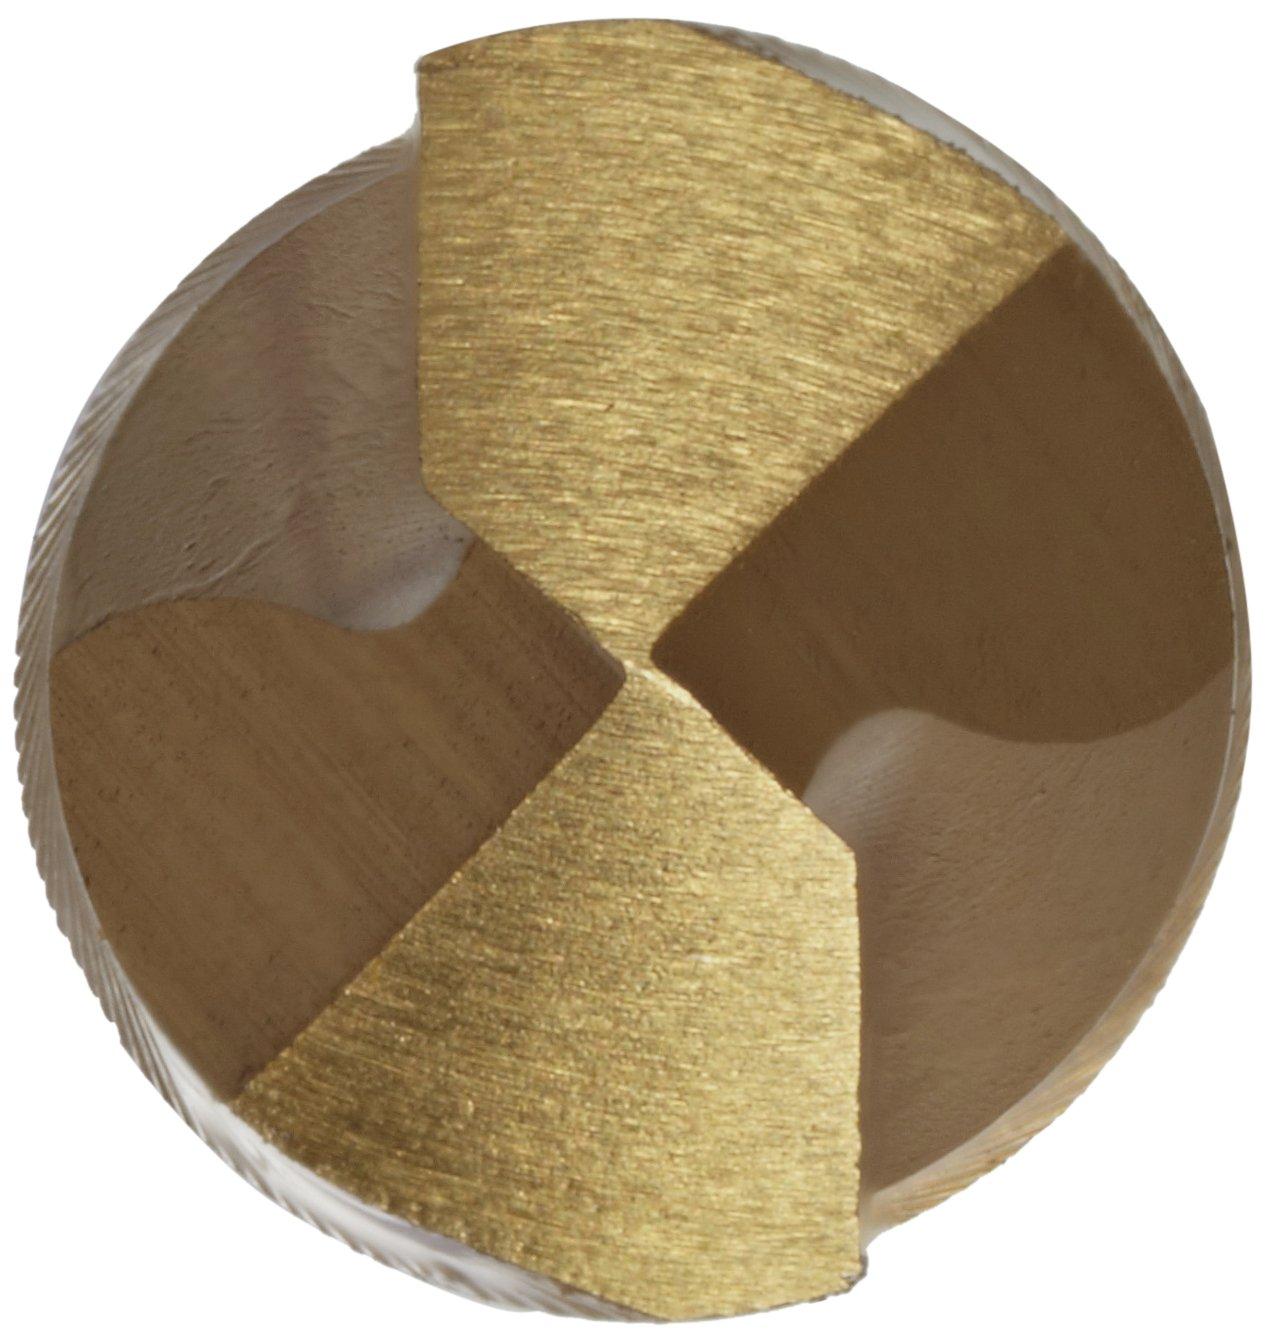 130 Degree Parabolic Spiral TiN Finish #23 Size Pack of 10 Straight Shank YG-1 DLGP High Speed Steel Gold-P Worm Pattern Type Jobber Drill Bit 19//128 Diameter x 3-1//8 Length